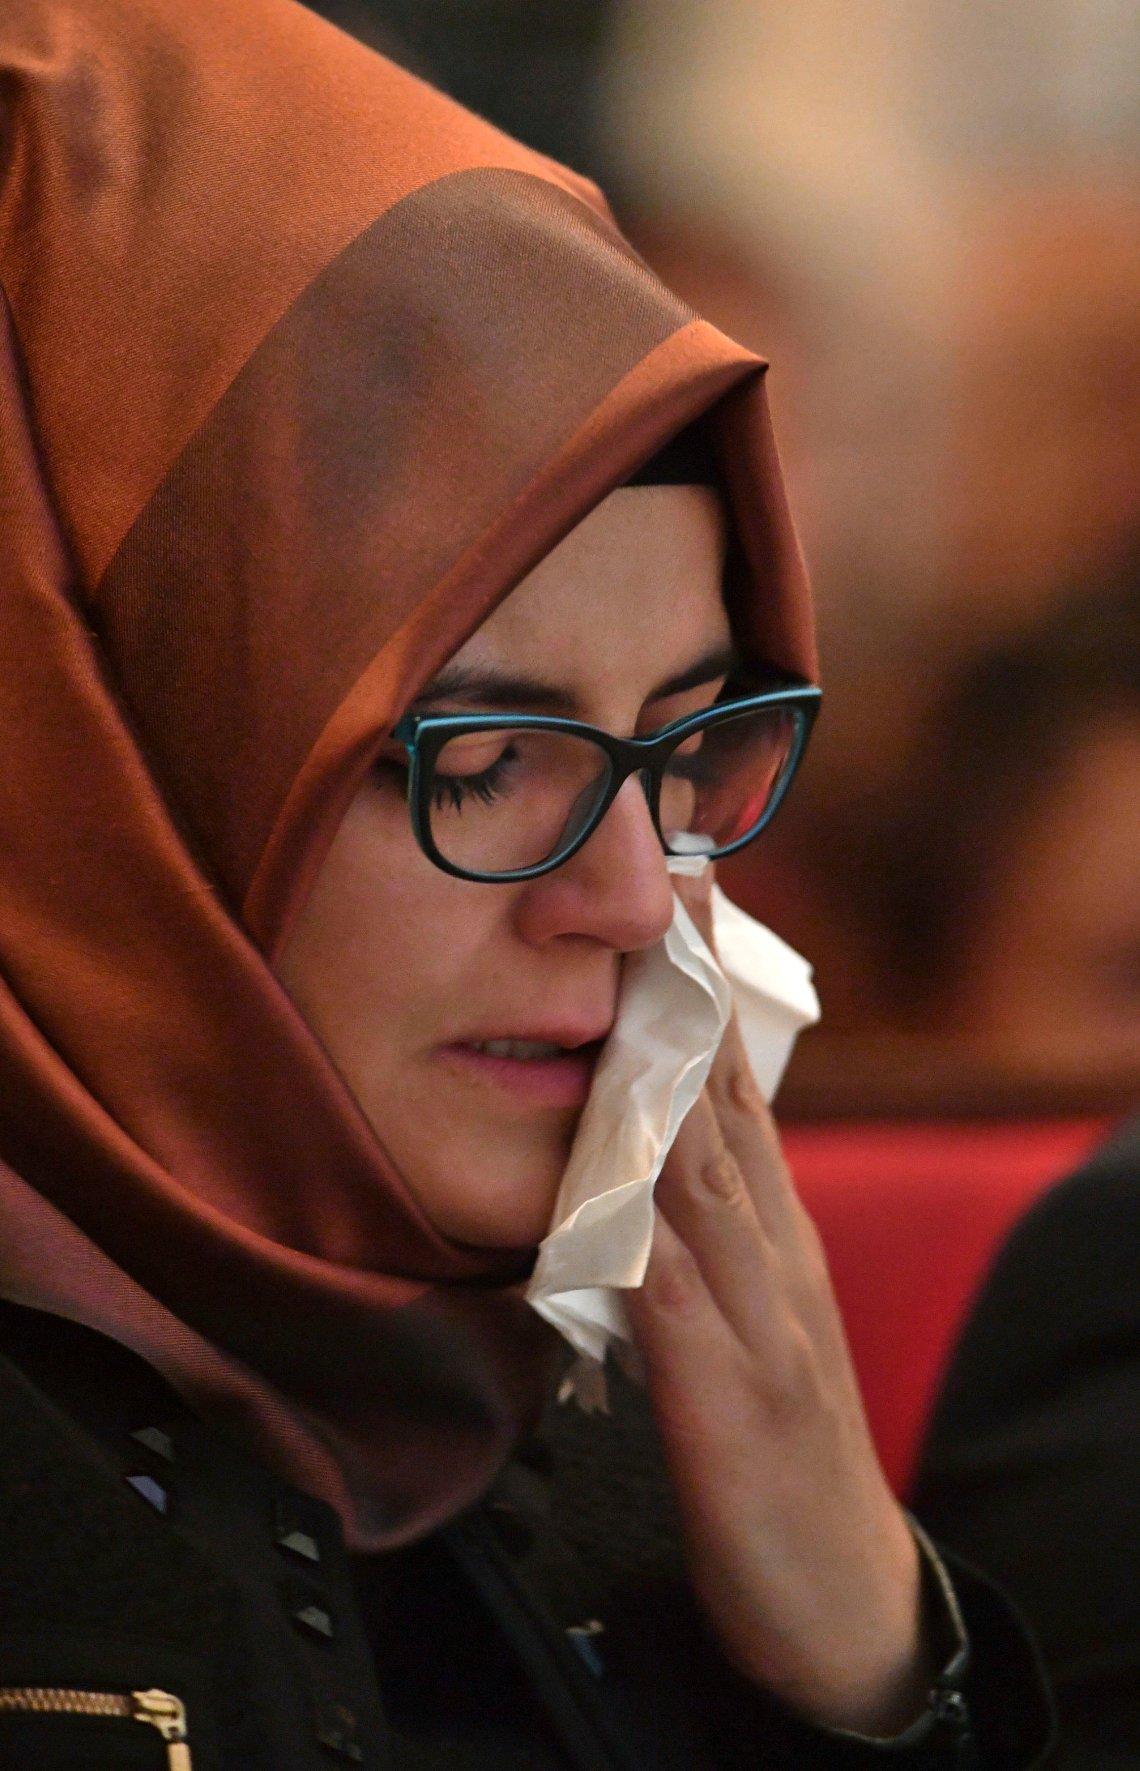 Hatice Cengiz, Jamal Khashoggi's fiancee